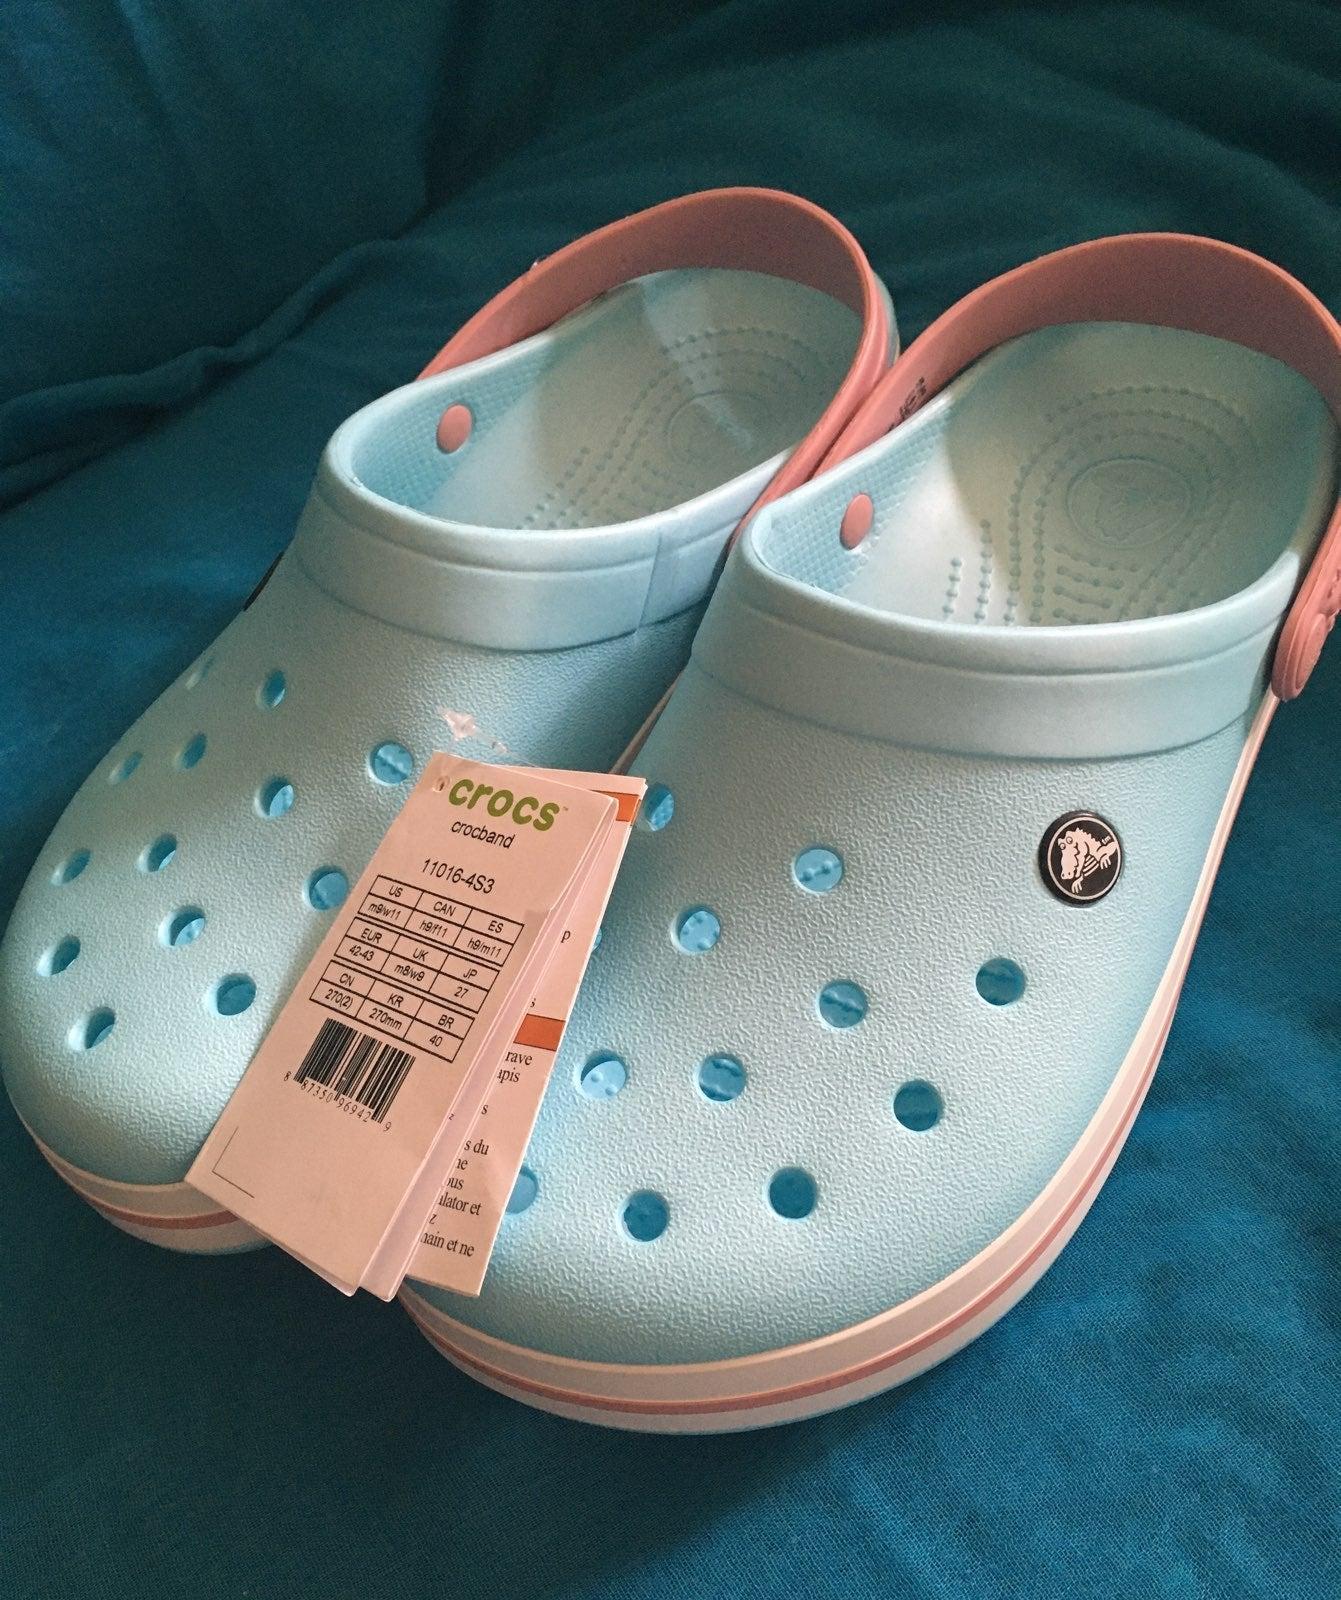 Crocs Crocband Size M9/W11